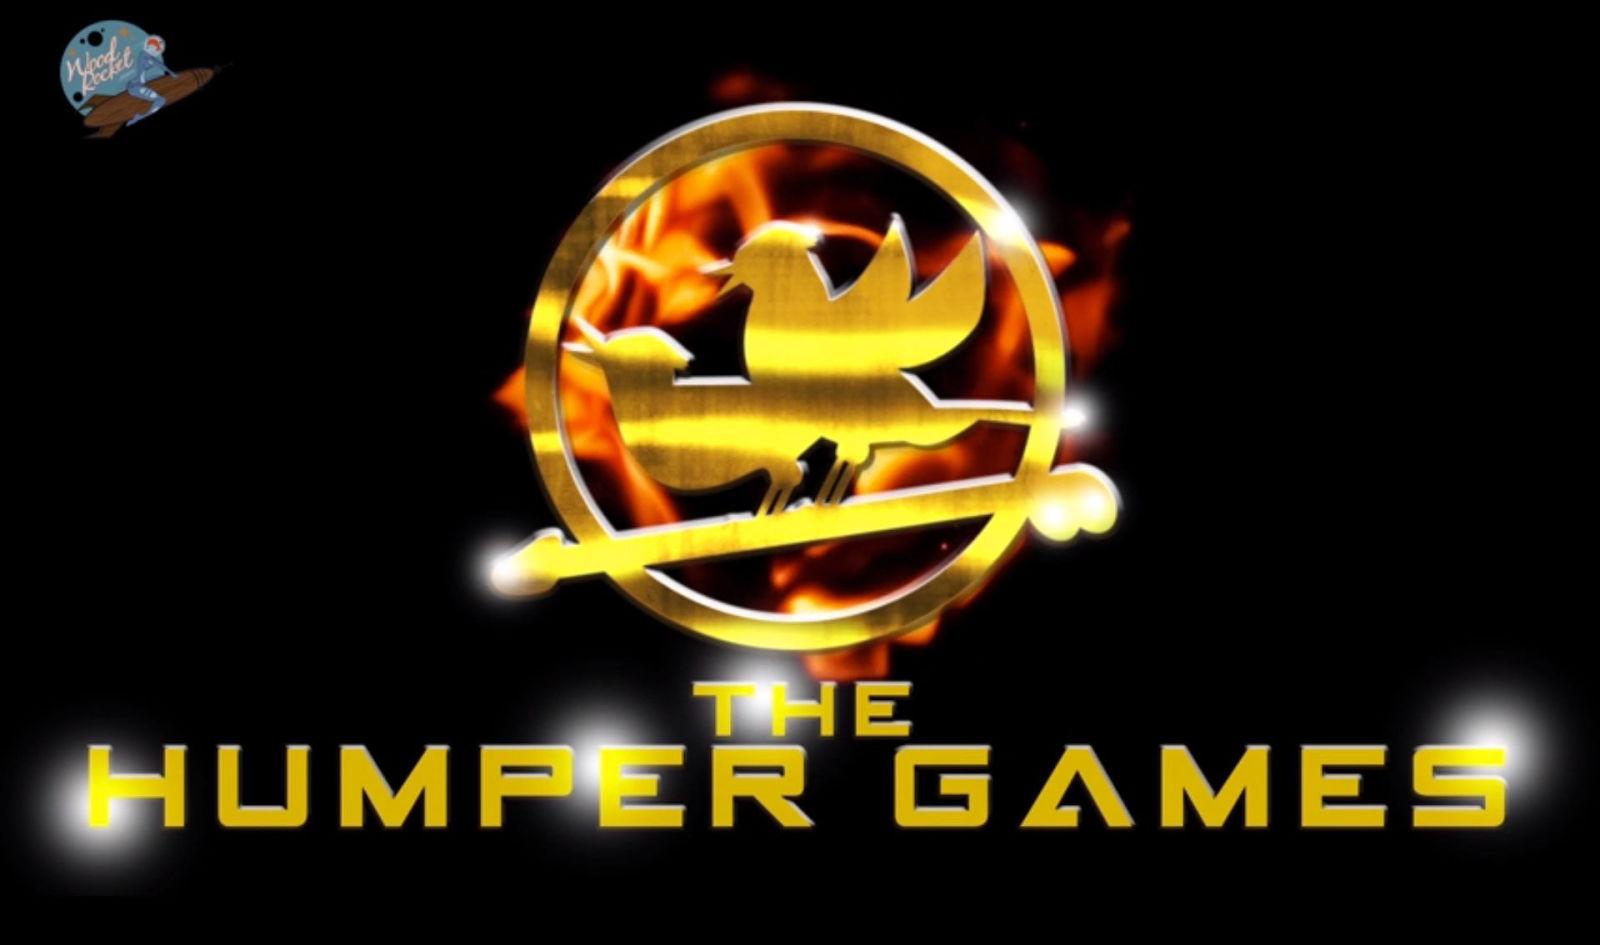 The humper games